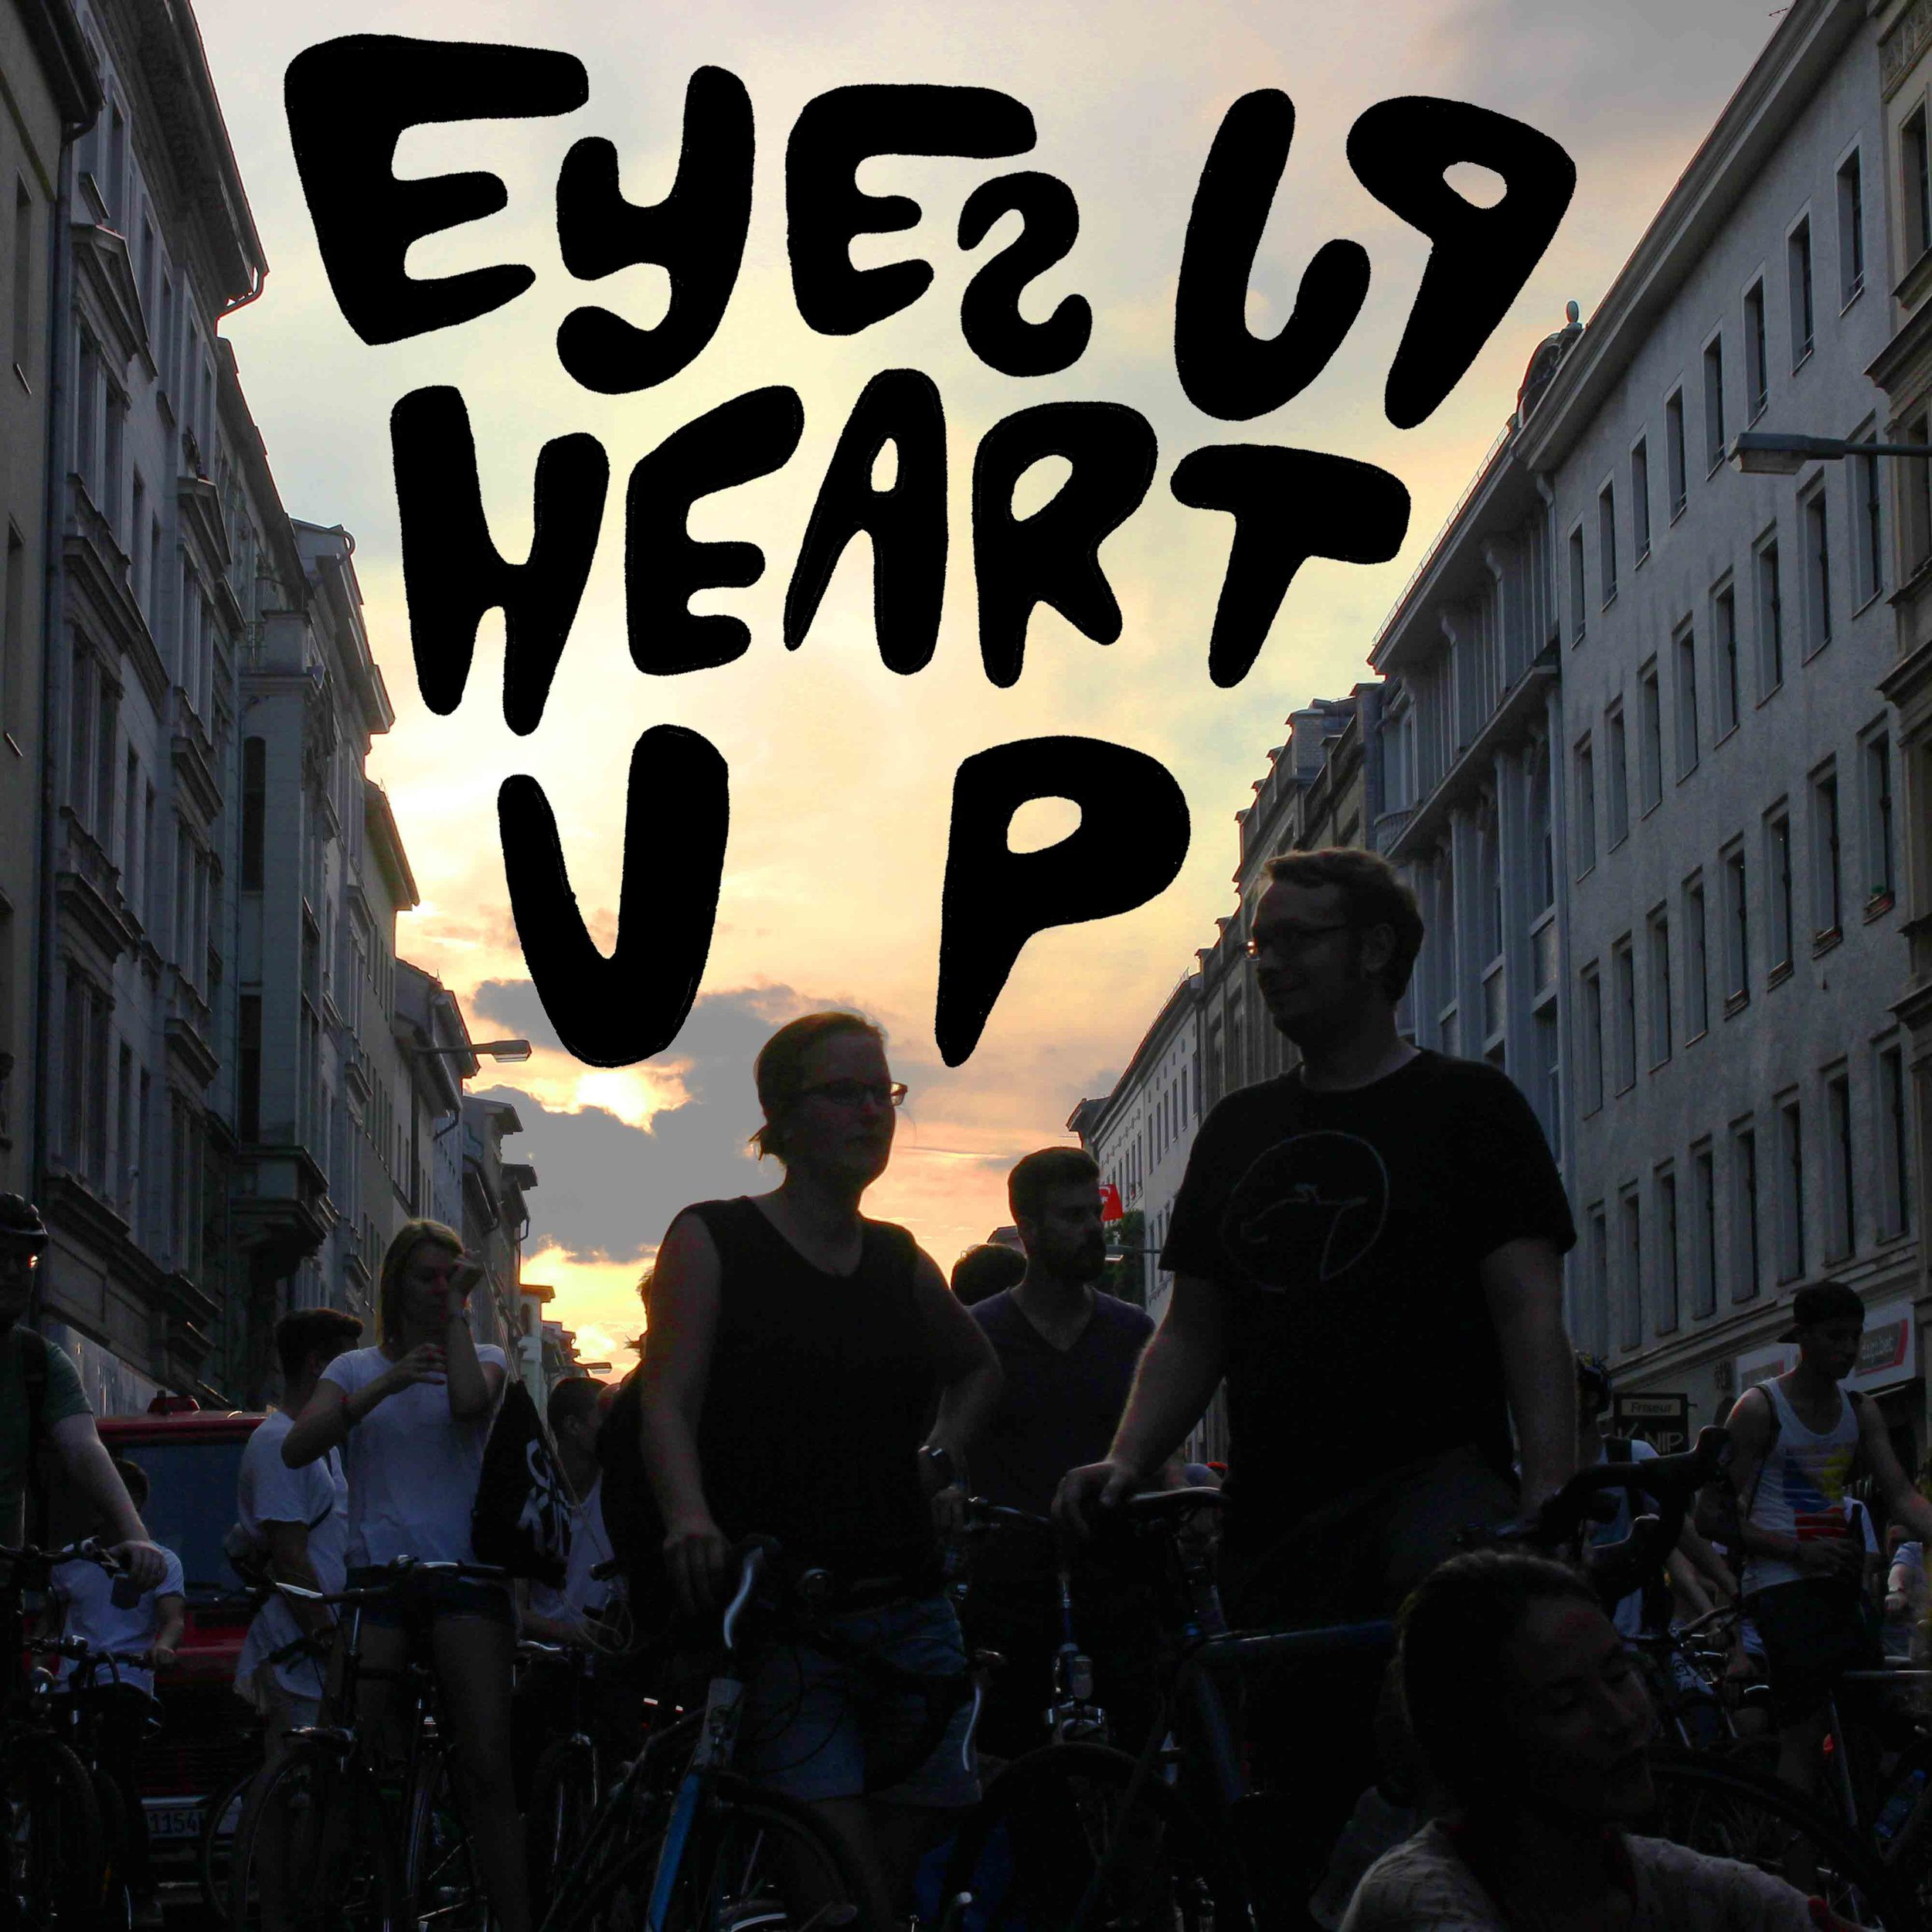 EyesUpHeartUp(sm).jpg